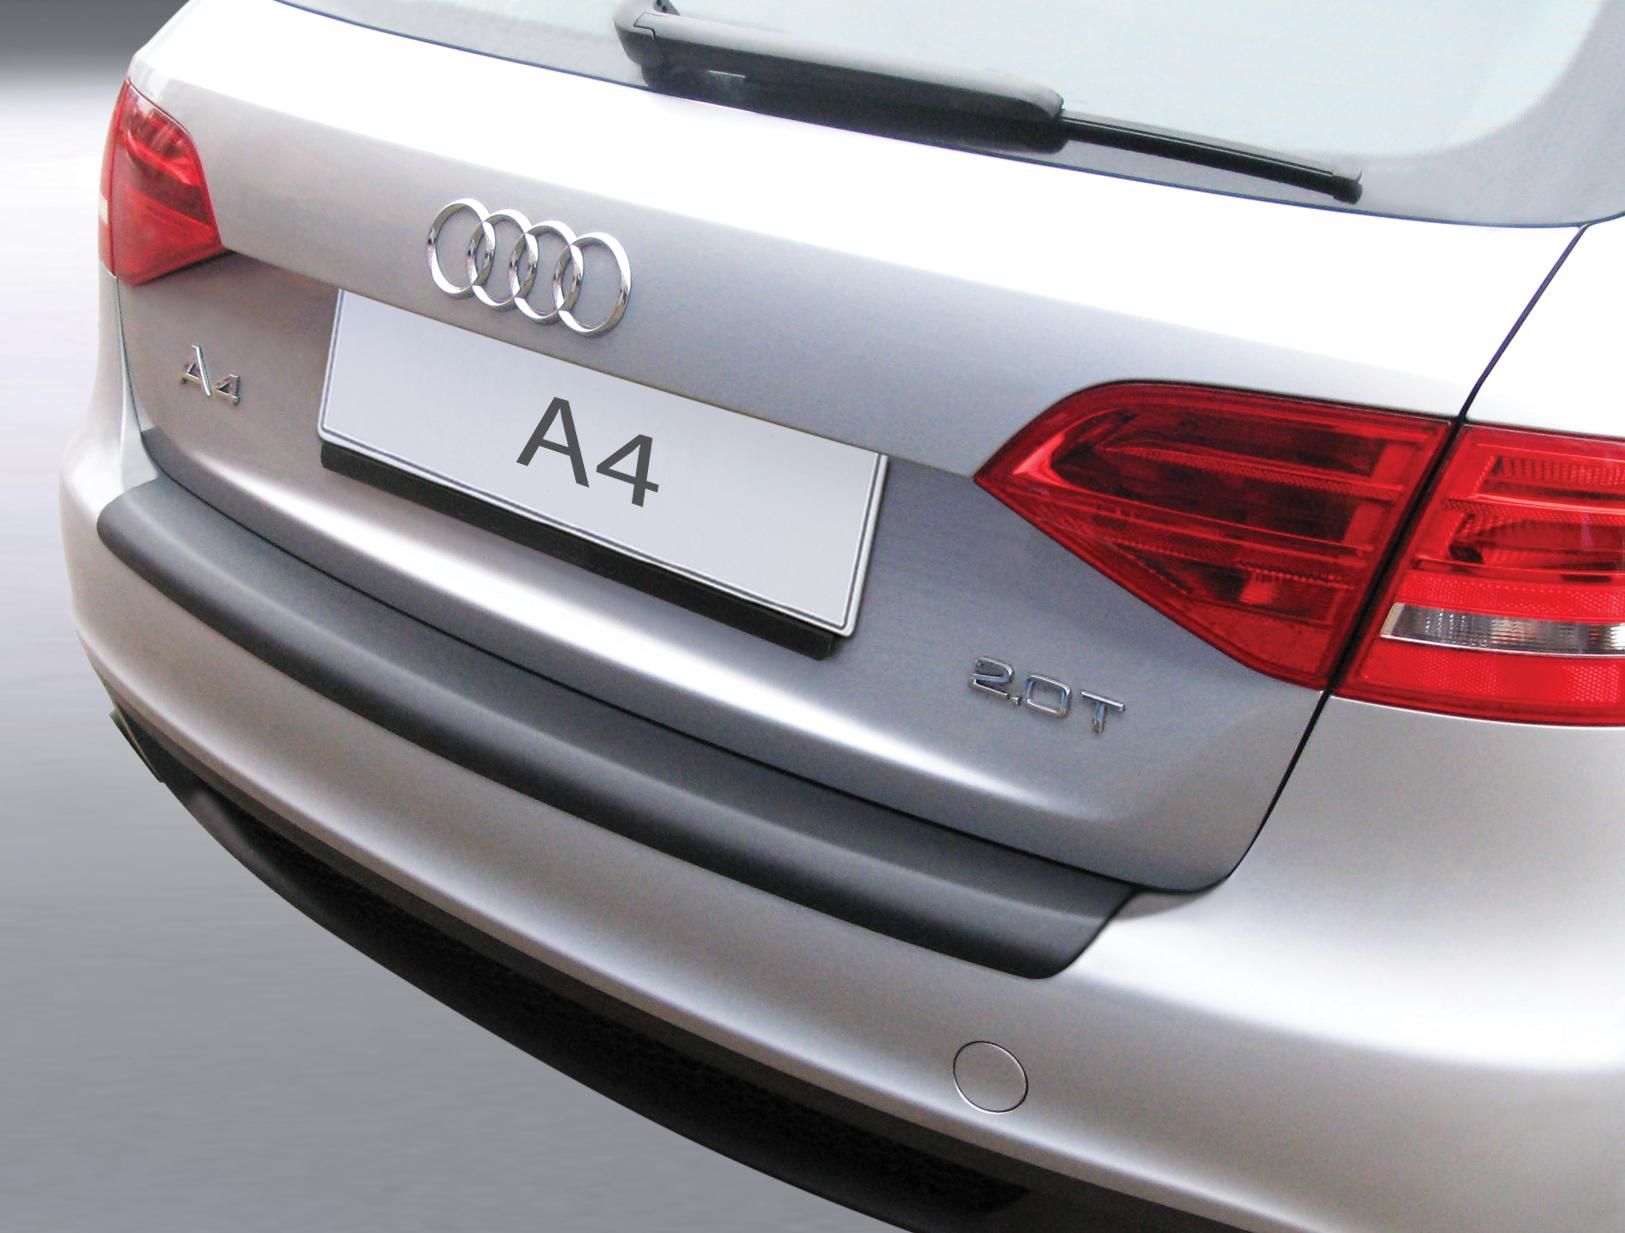 Накладка на задний бампер Audi A4 Avant, Ауди А4 универсал, 2008-2012